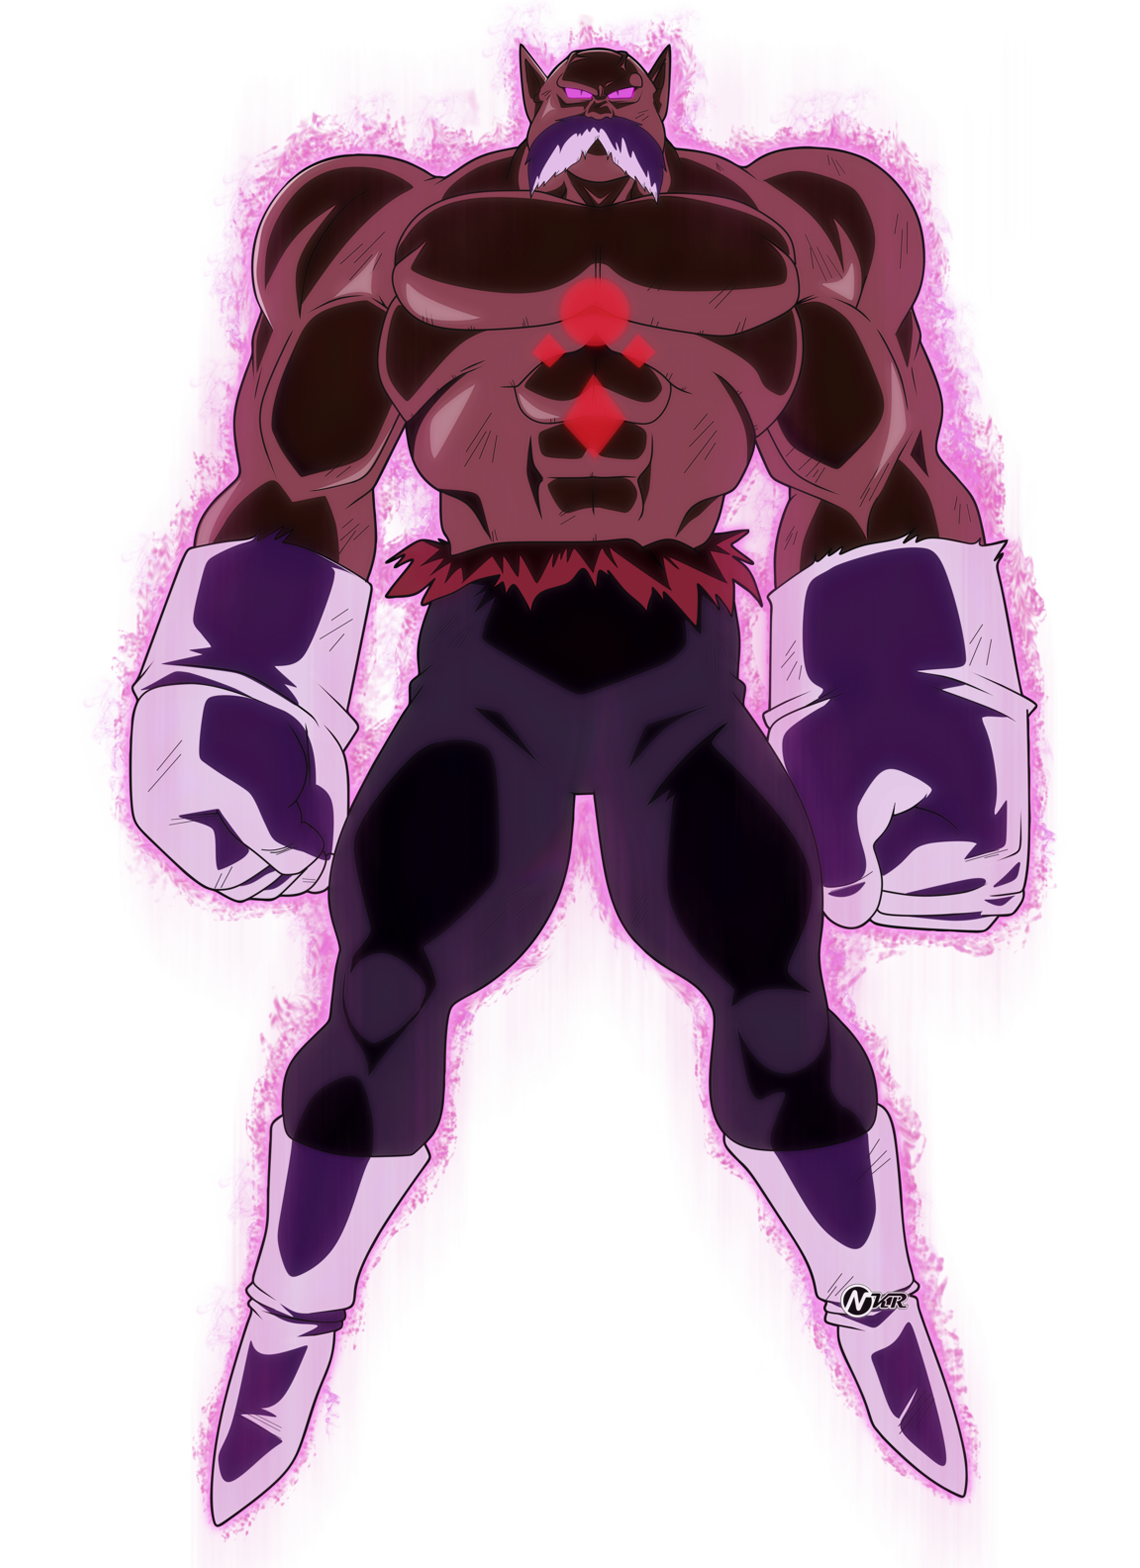 Toppo Deus Da Destruicao Desenhos De Anime Anime